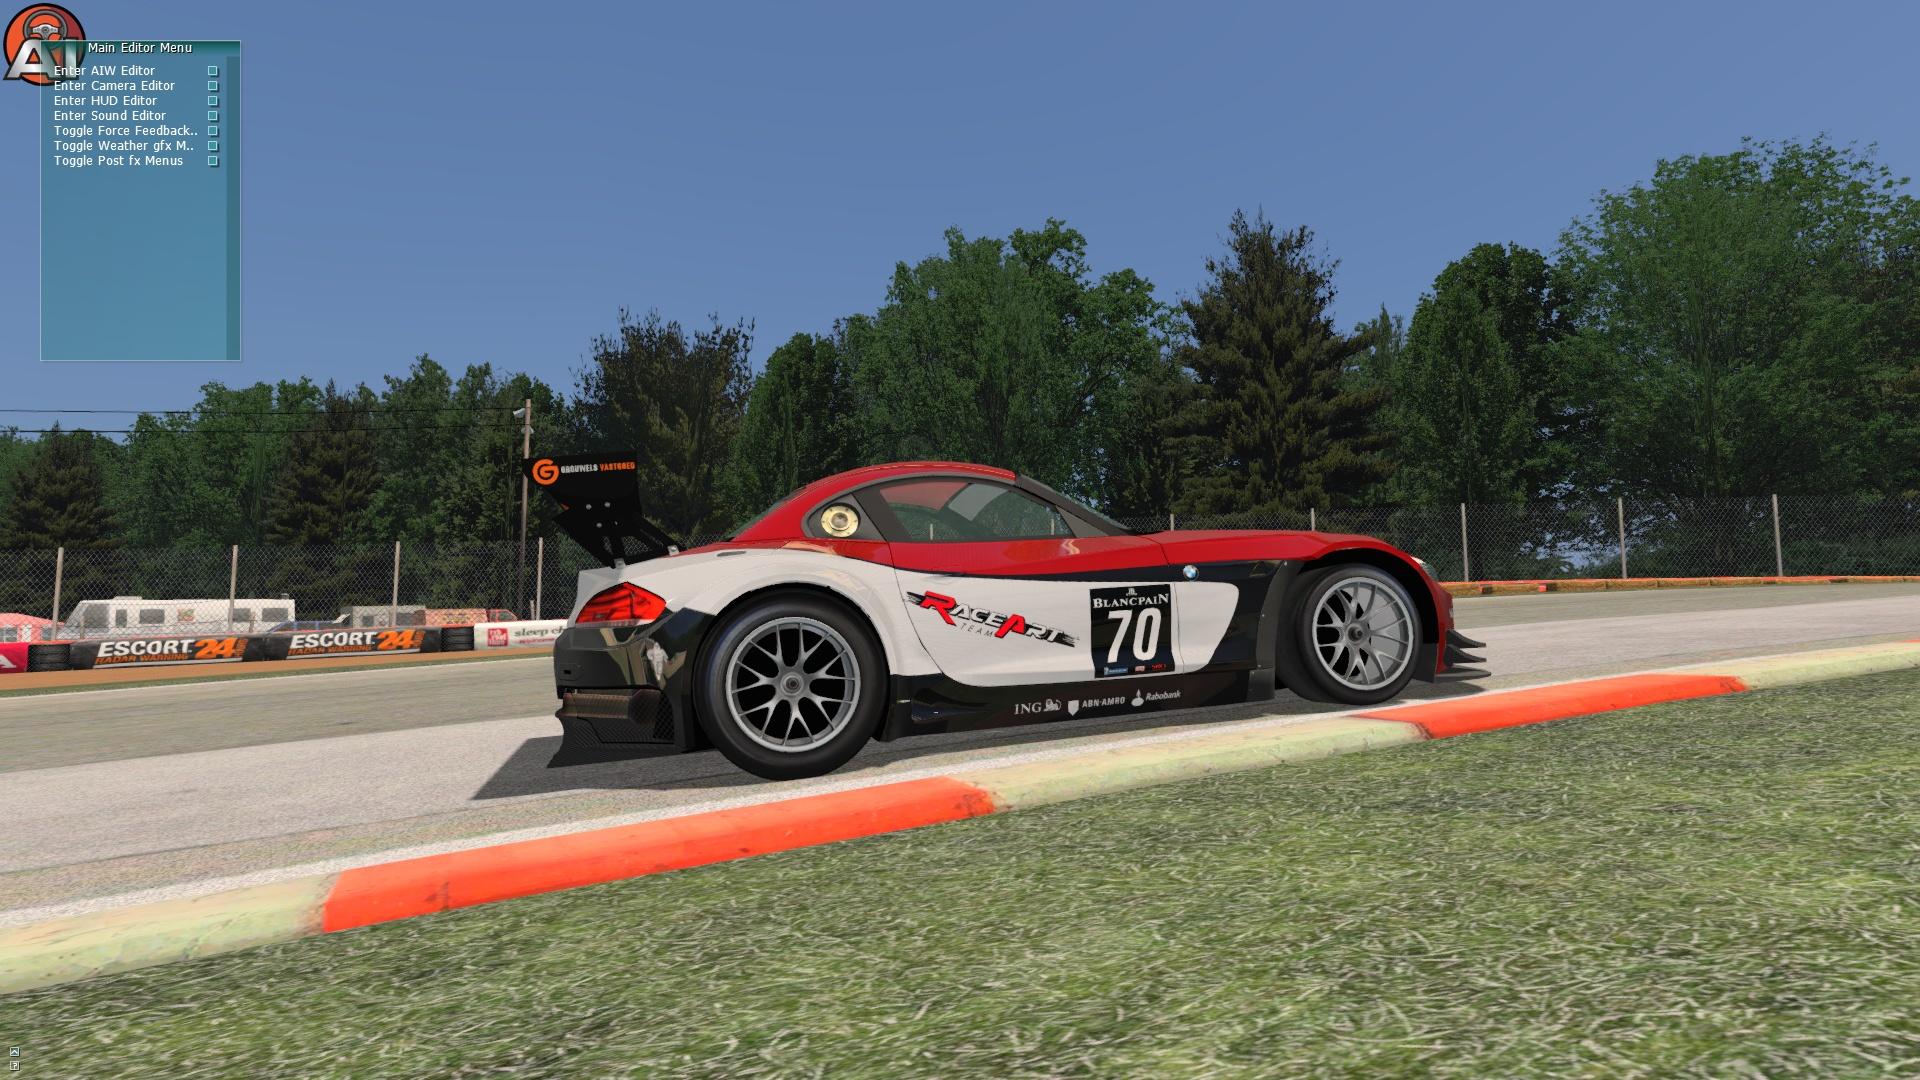 FIA GT3 for rFactor 2 – Development Stopped – VirtualR net – 100